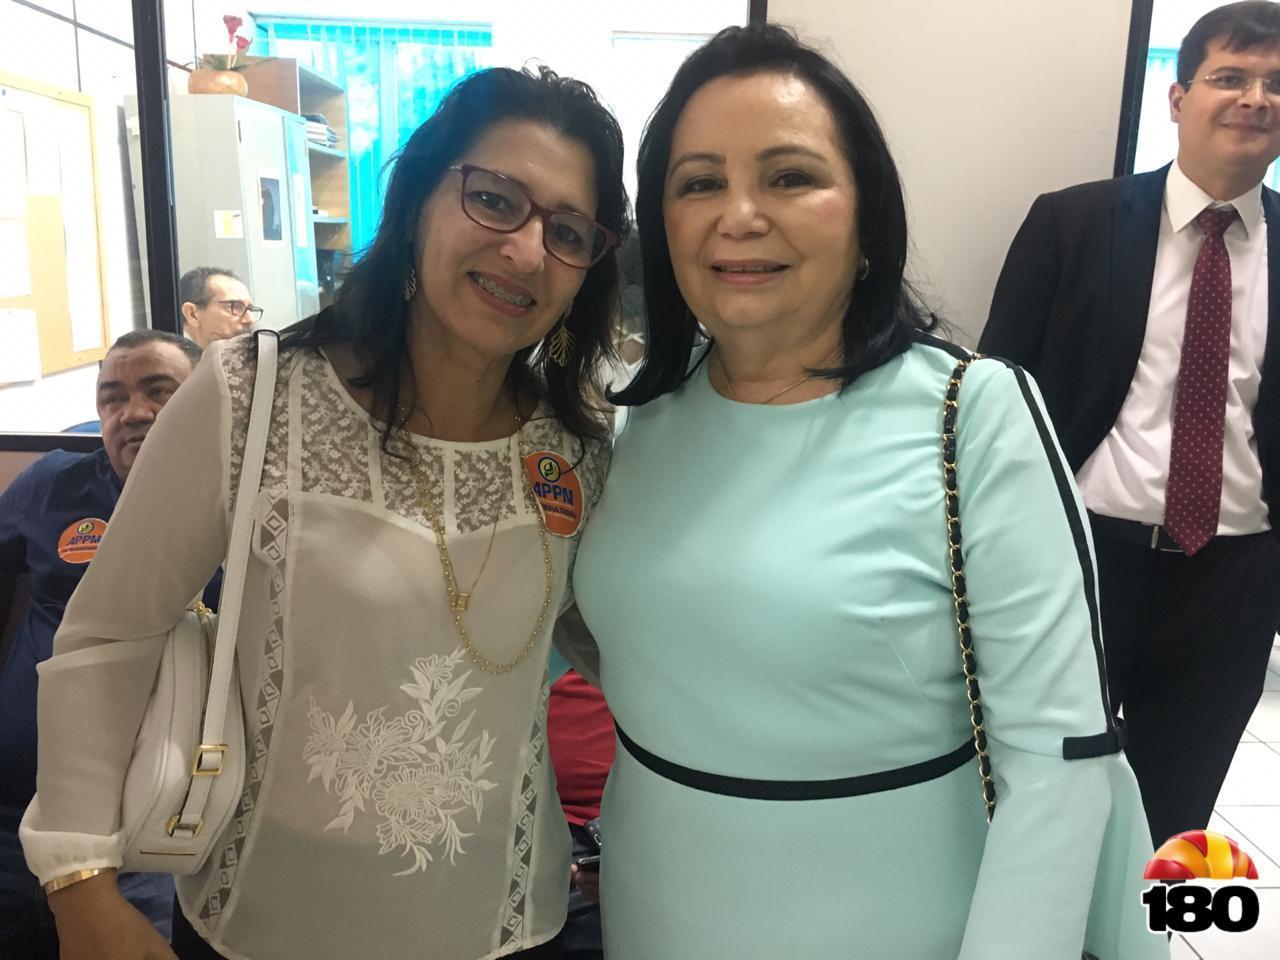 Prefeita Lúcia Sá ao lado da primeira-dama de Água Branca, Maria da Paz